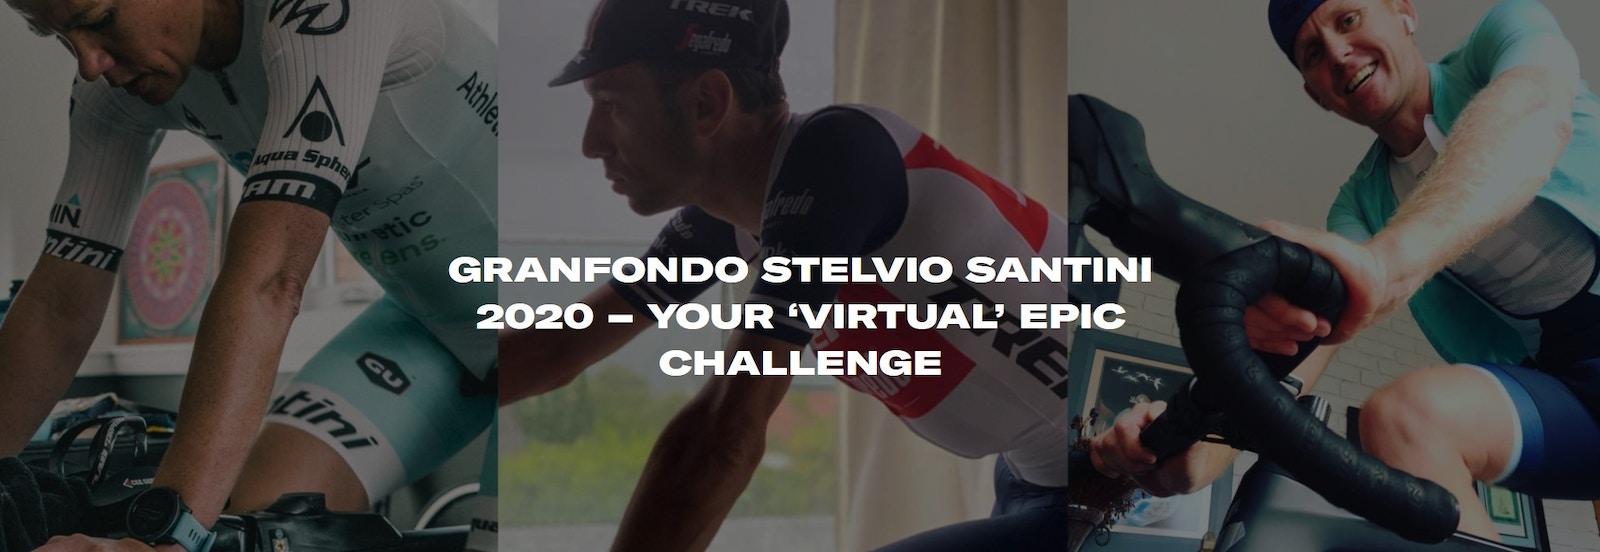 "Santini - Granfondo Stelvio Santini 2020 - Your ""Virtual"" Epic Challenge"